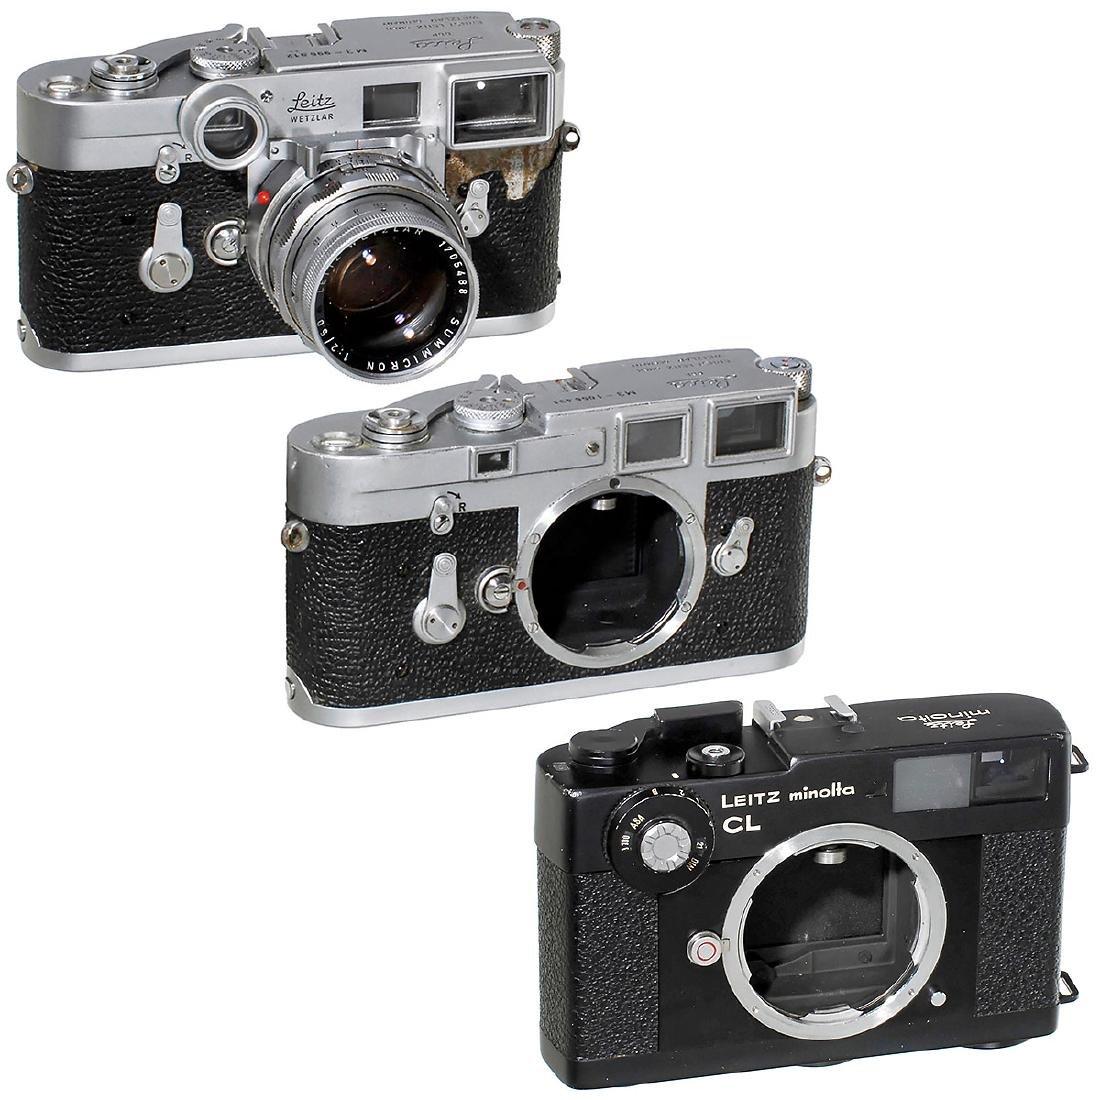 2 x Leica M3 and Leitz minolta CL